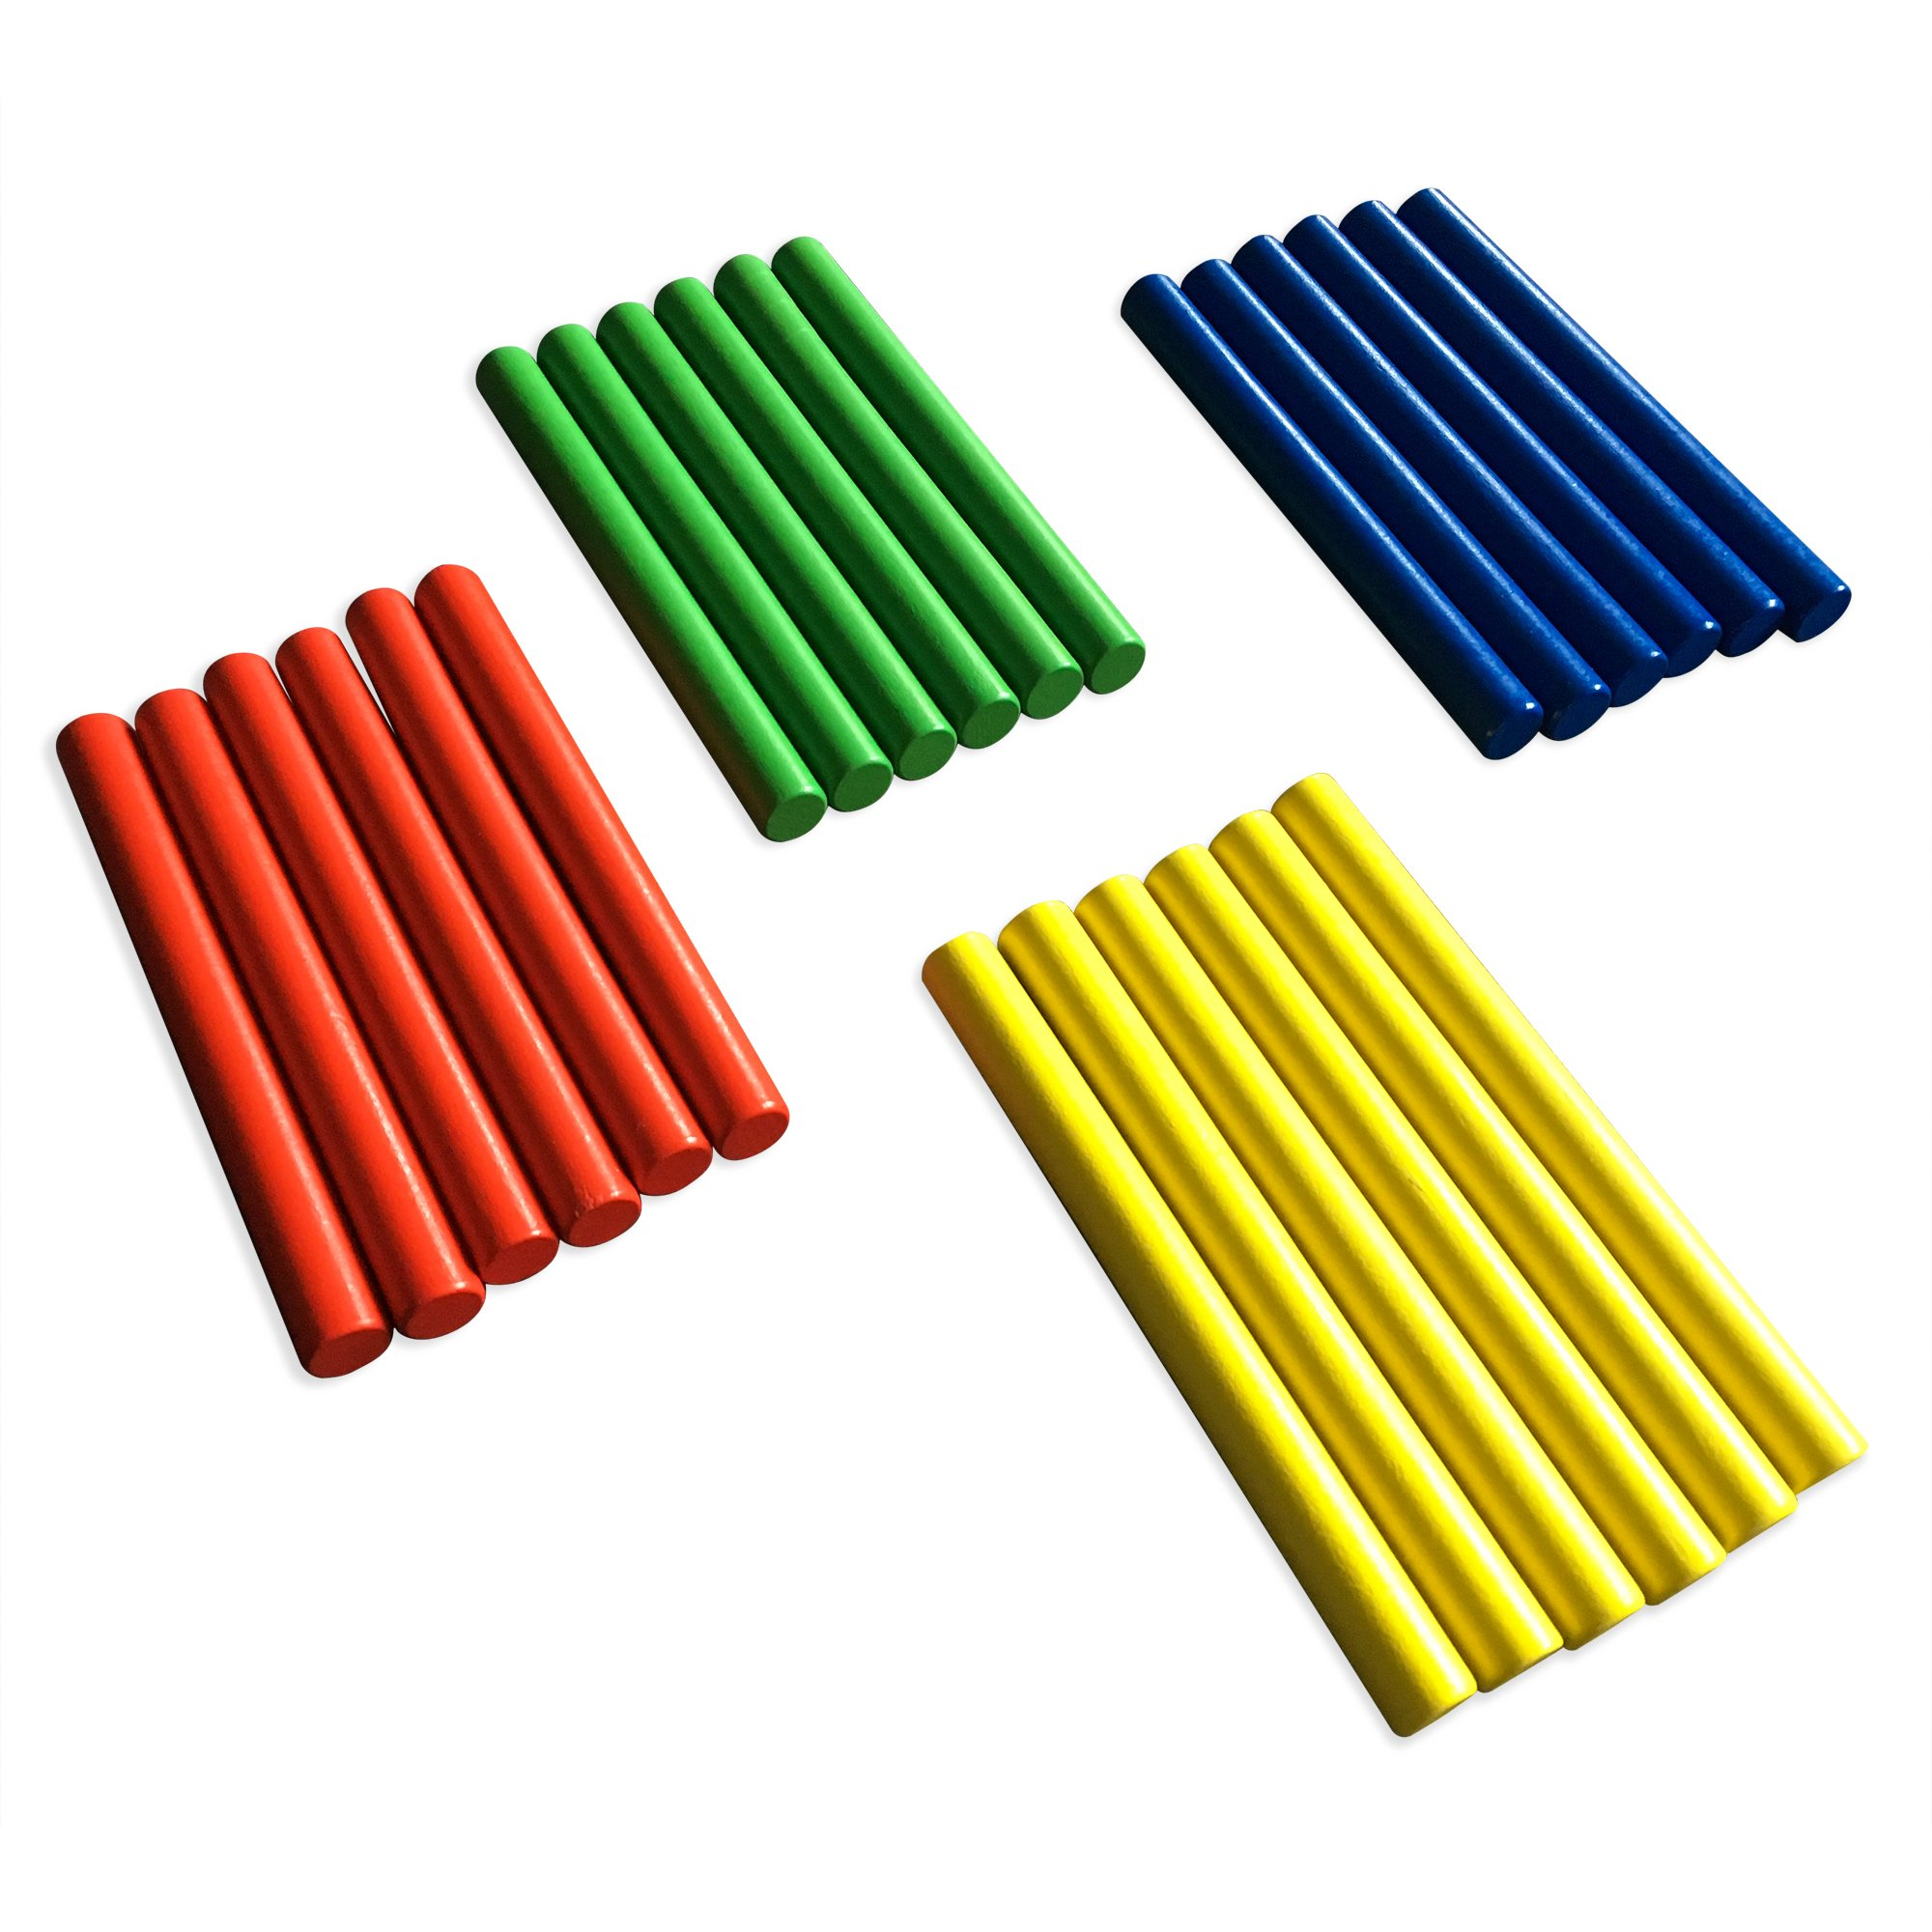 Rhythm Lummi Sticks GiftedMusicKids | Set of 24 Sticks | Musical Instruments for Toddlers by FAXADELLA